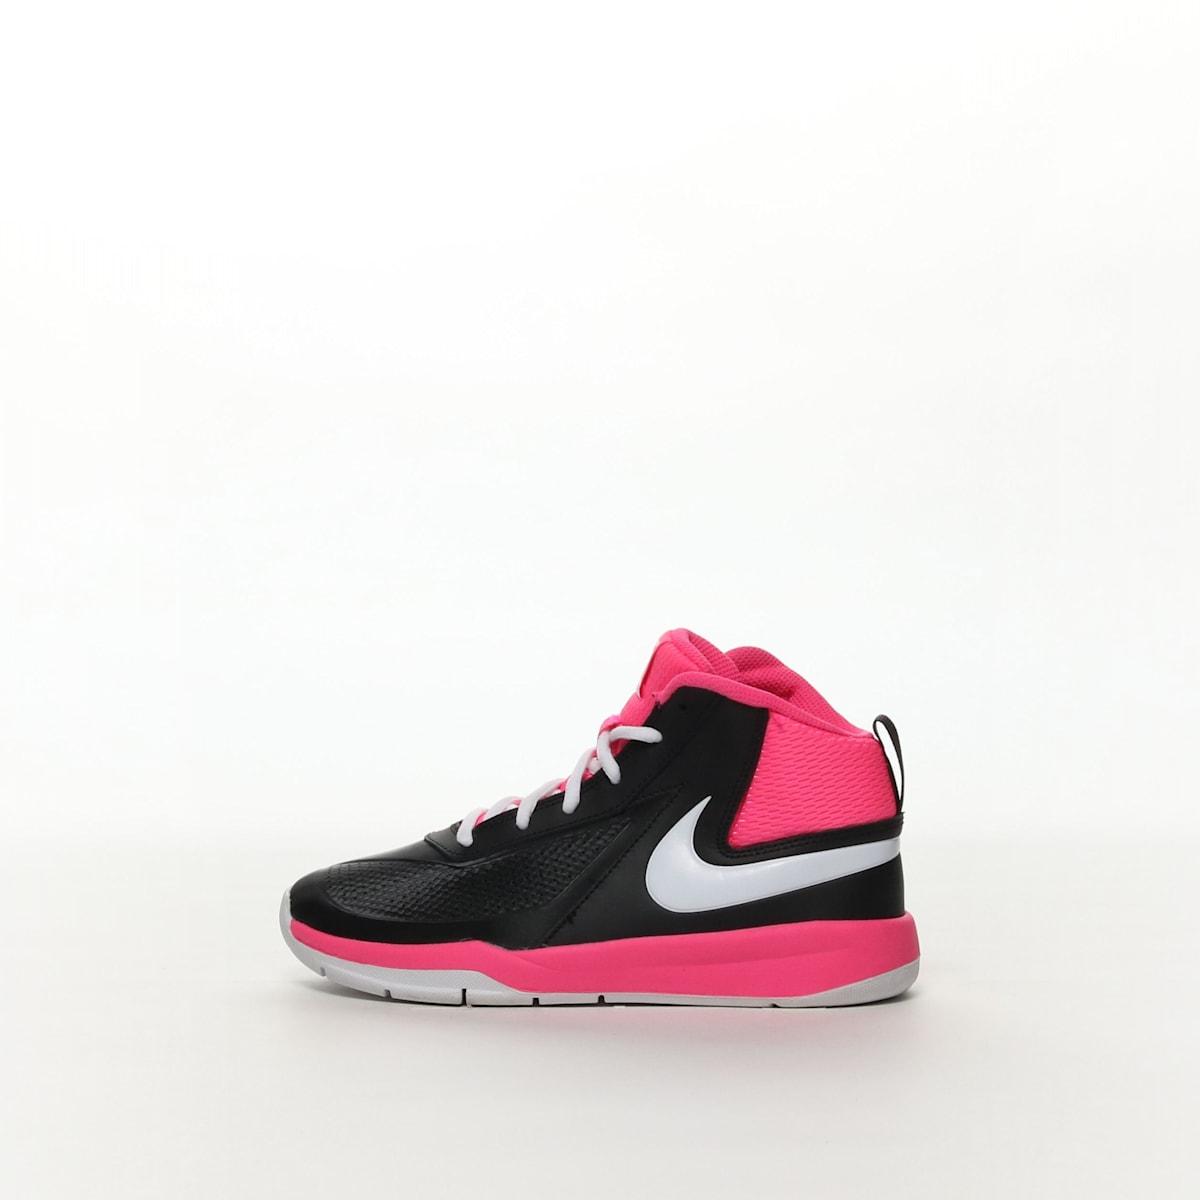 cdfb083586 Boys' Nike Team Hustle D 7 (GS) Basketball Shoe - BLACK/WHITE – Resku